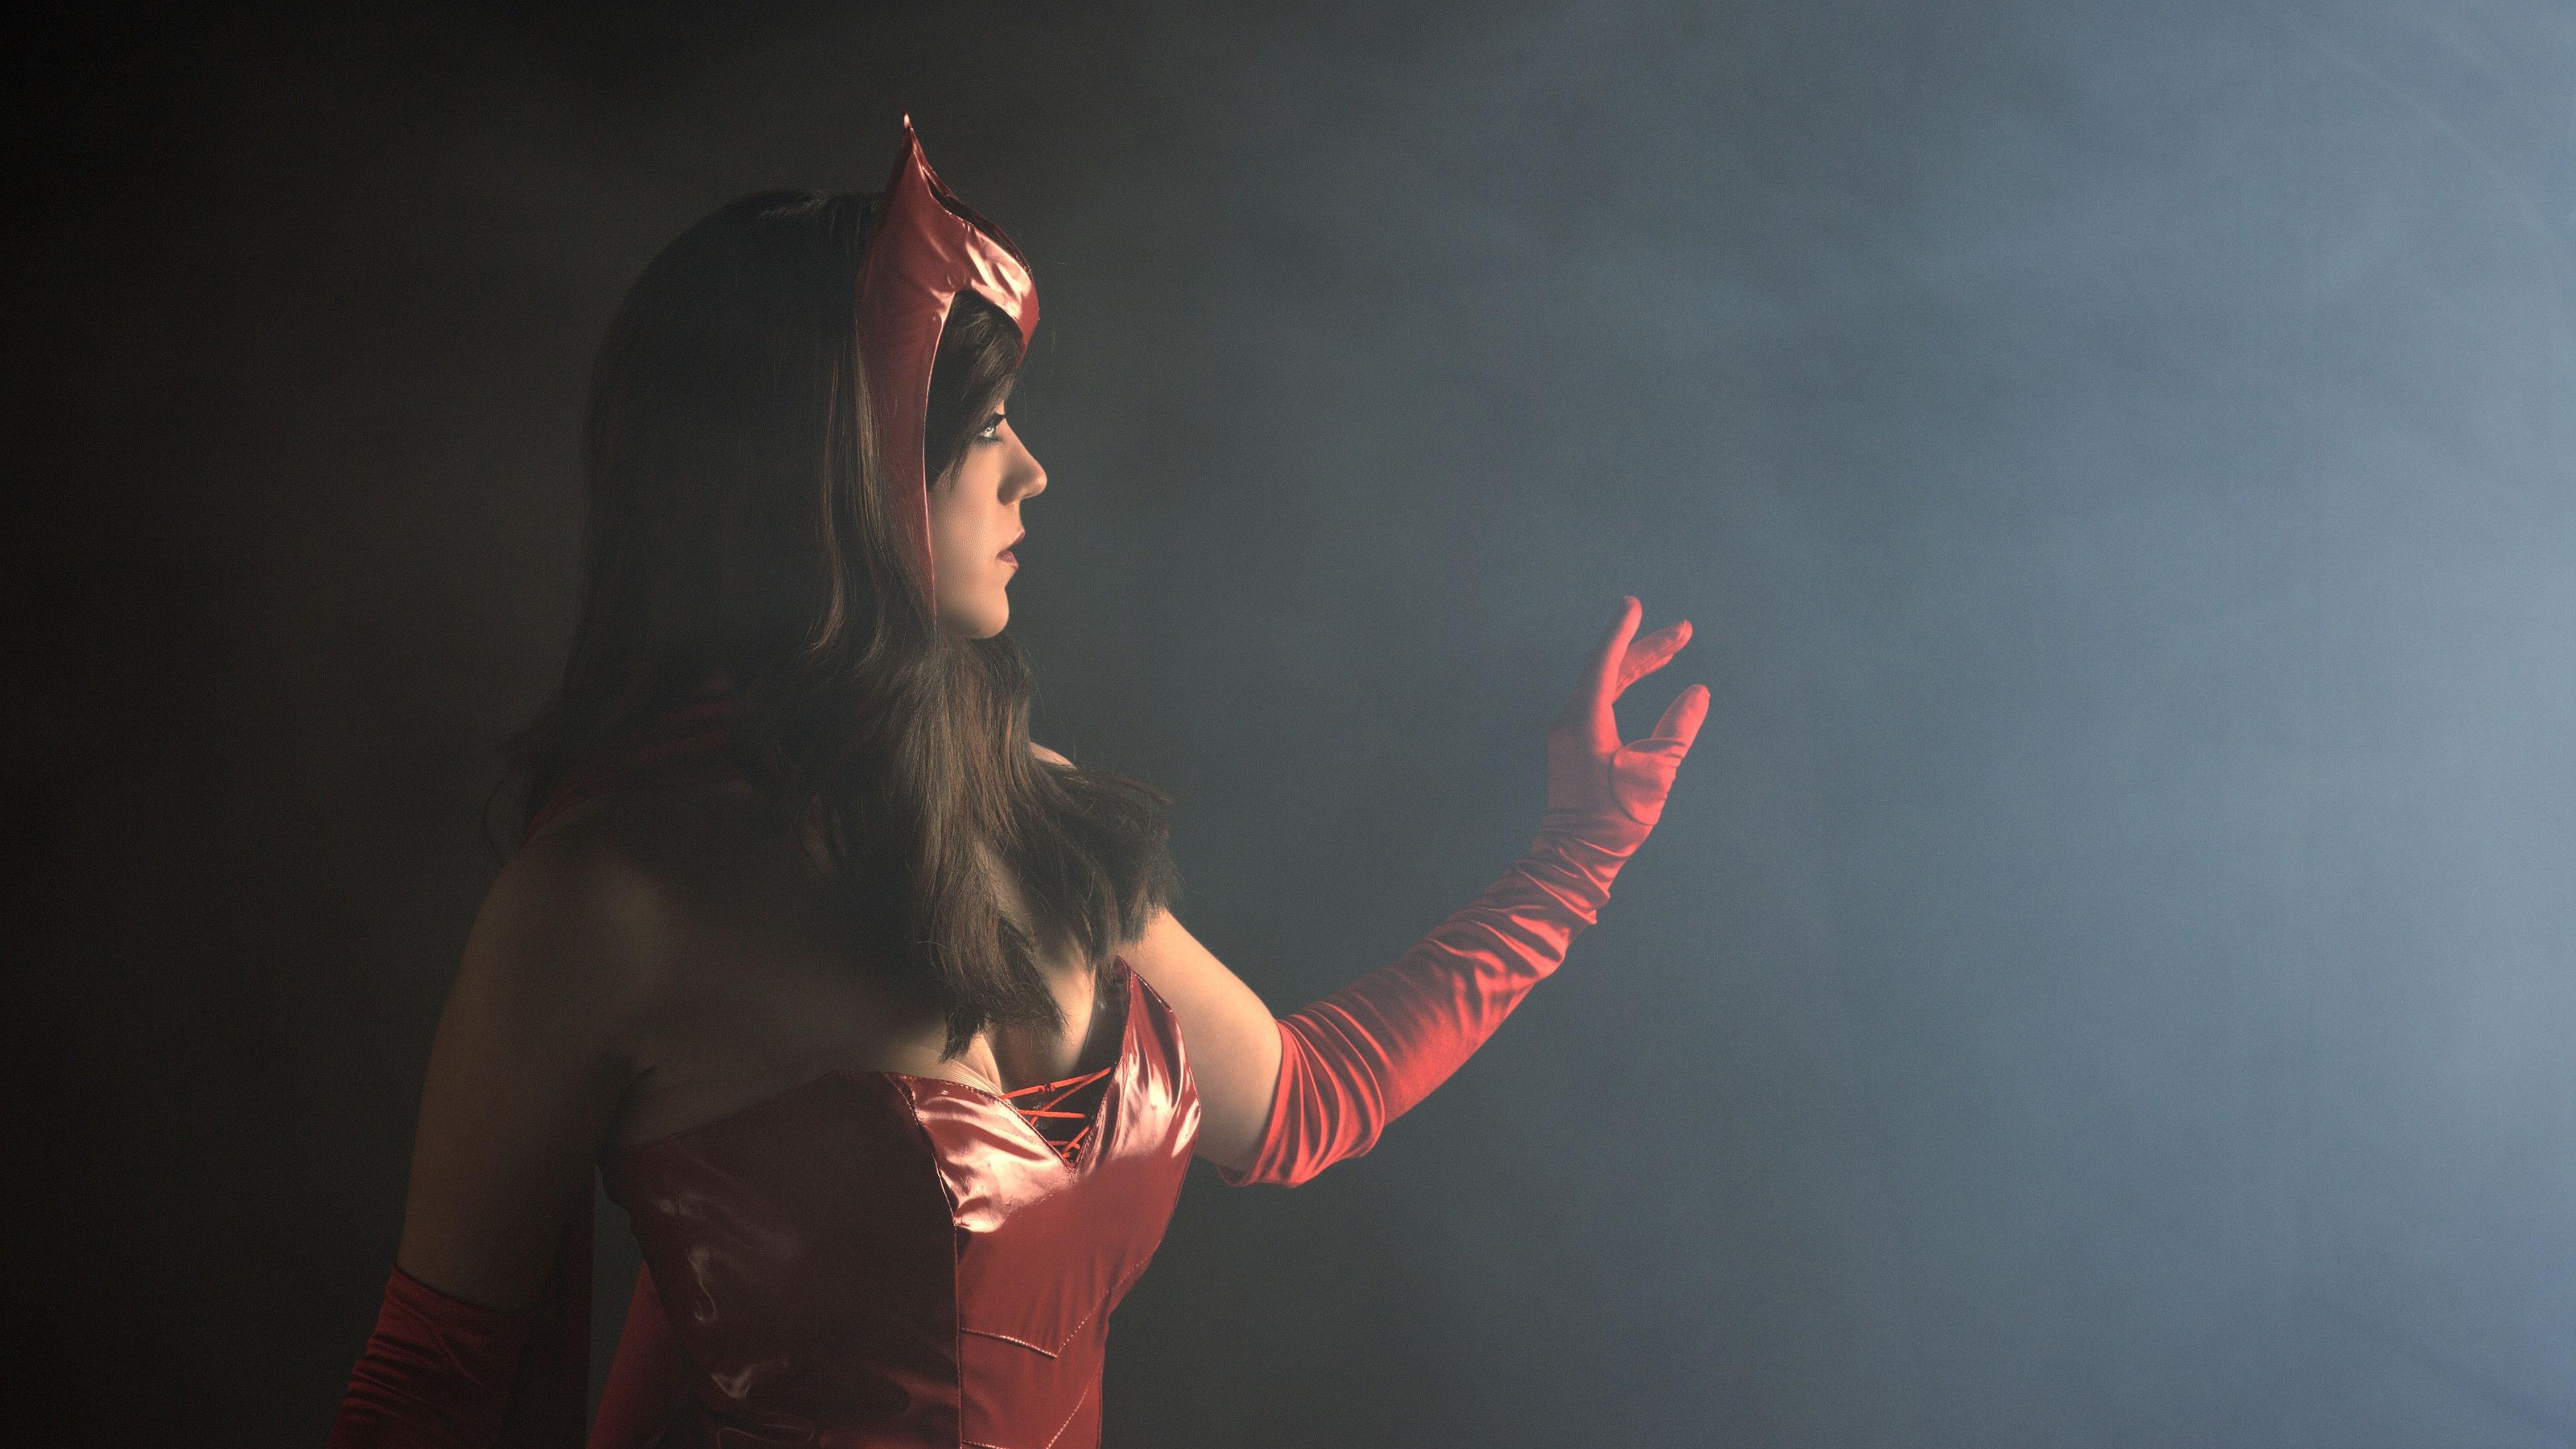 Hd Wallpapers Scarlet Witch Avengers 1024 X 1280 931 Kb Jpeg HD 3900x2194